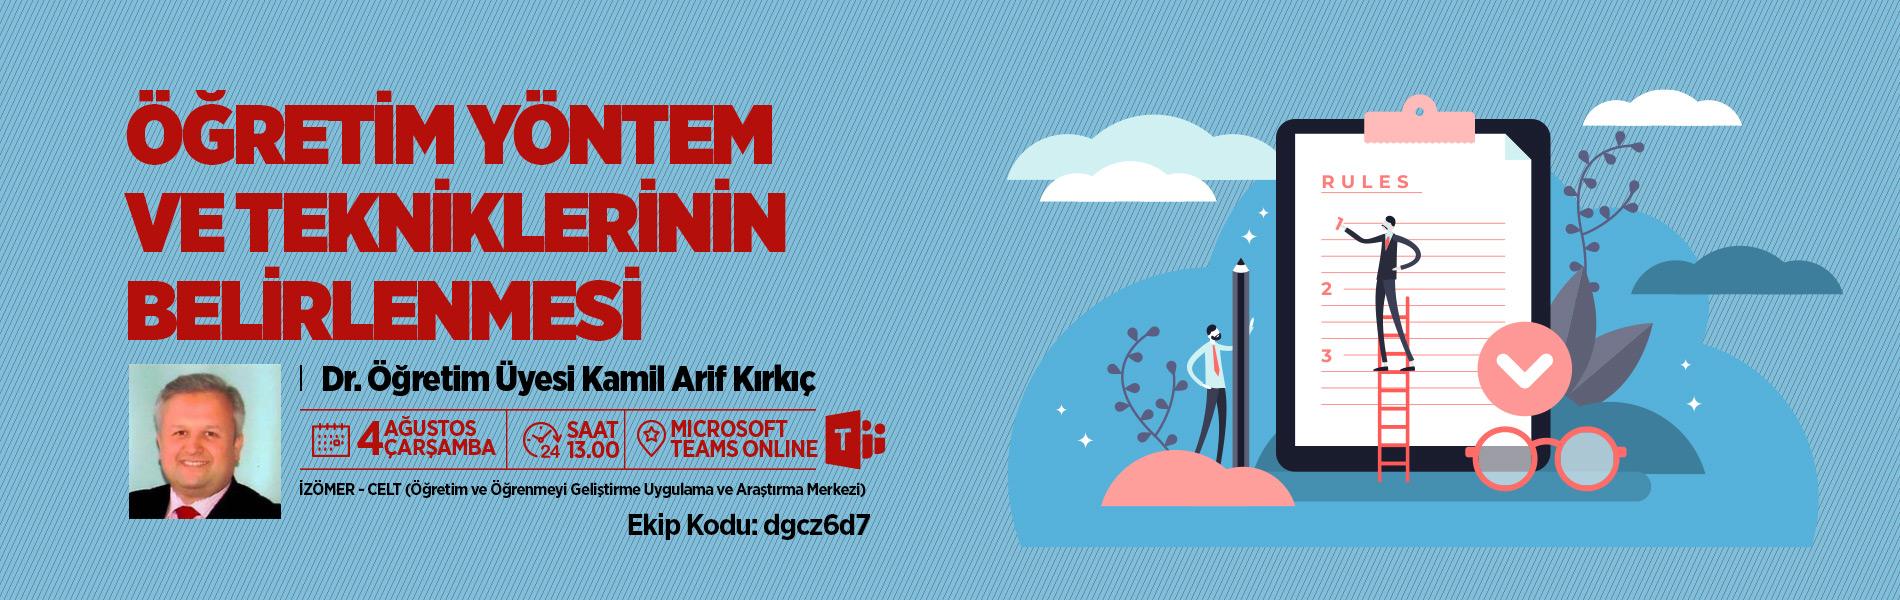 OGRENIM-YONTEM-19X6